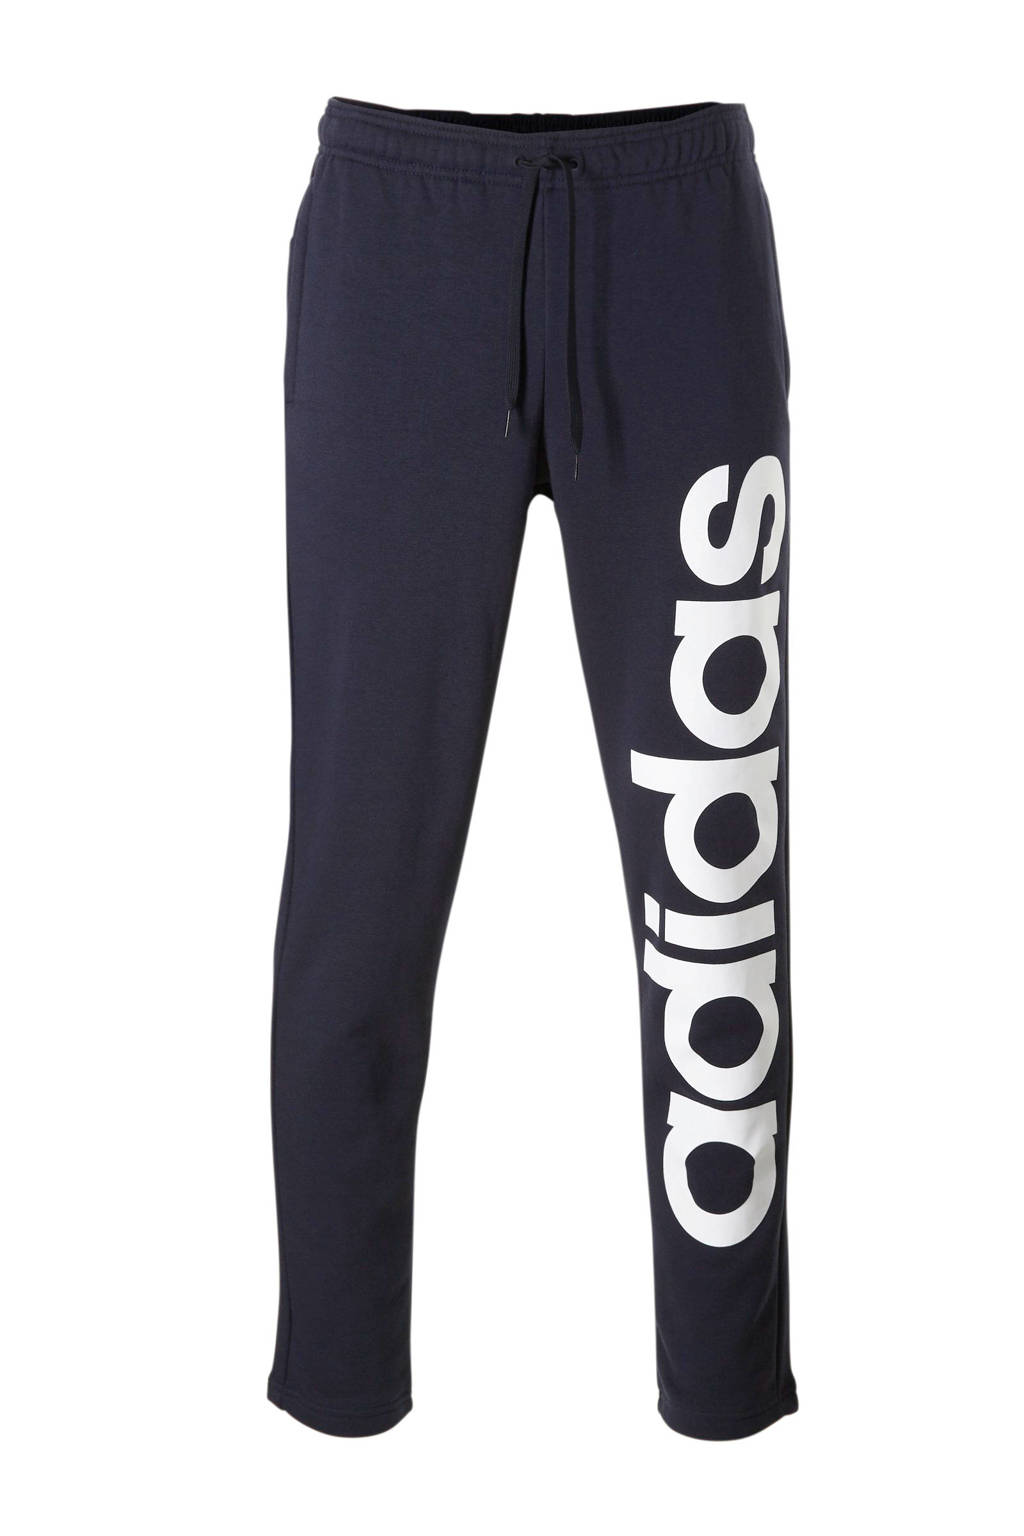 adidas performance joggingbroek donkerblauw, Donkerblauw